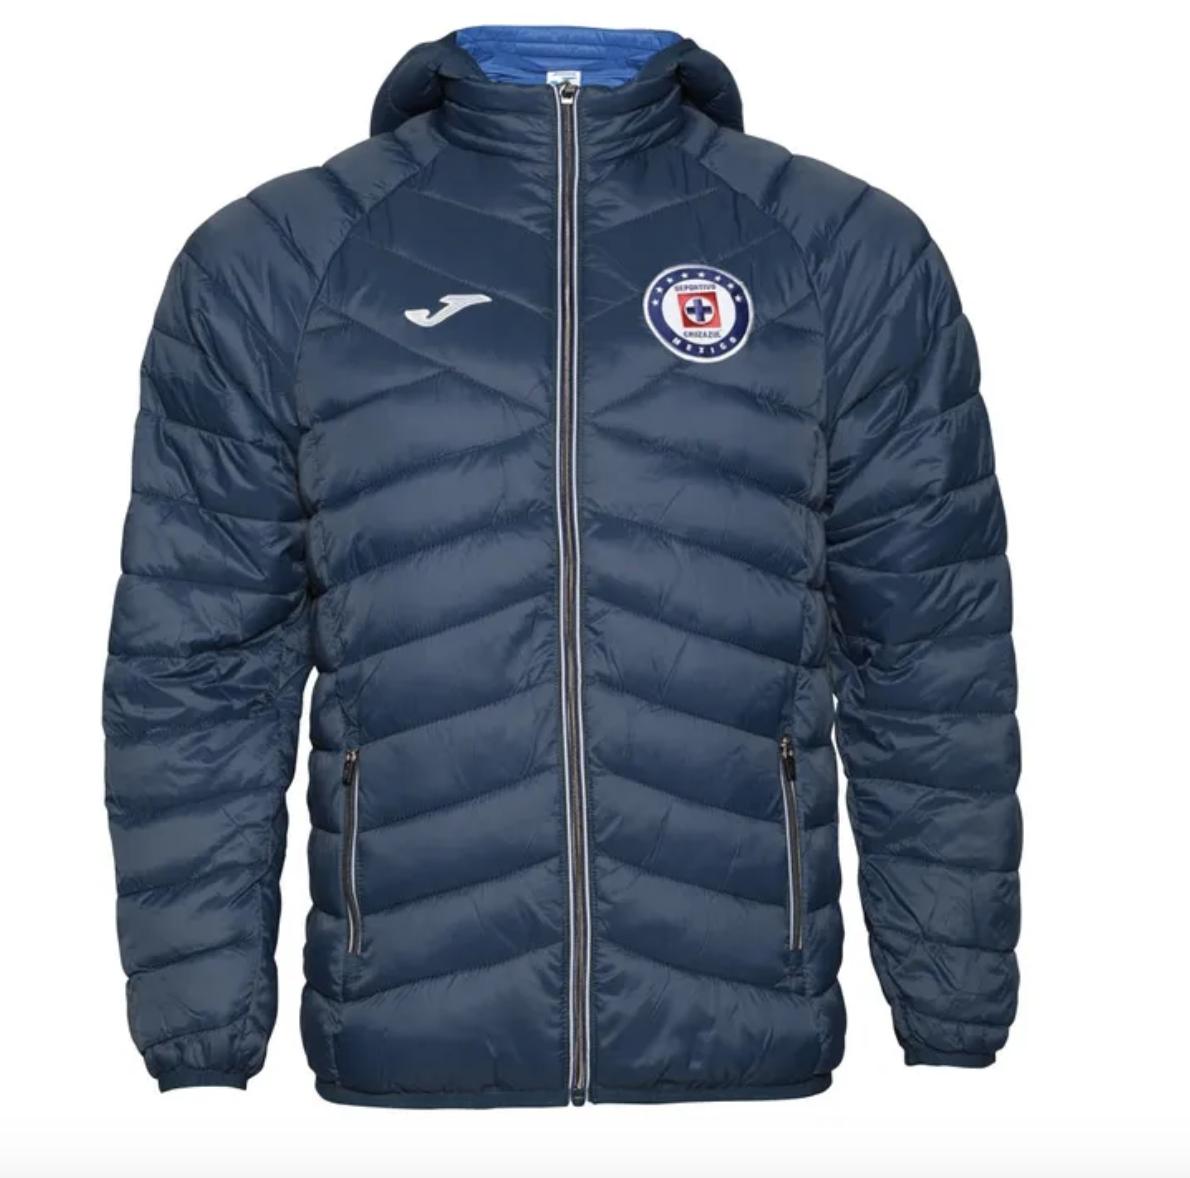 Official Cruz Azul Winter Jacket (Authentic)